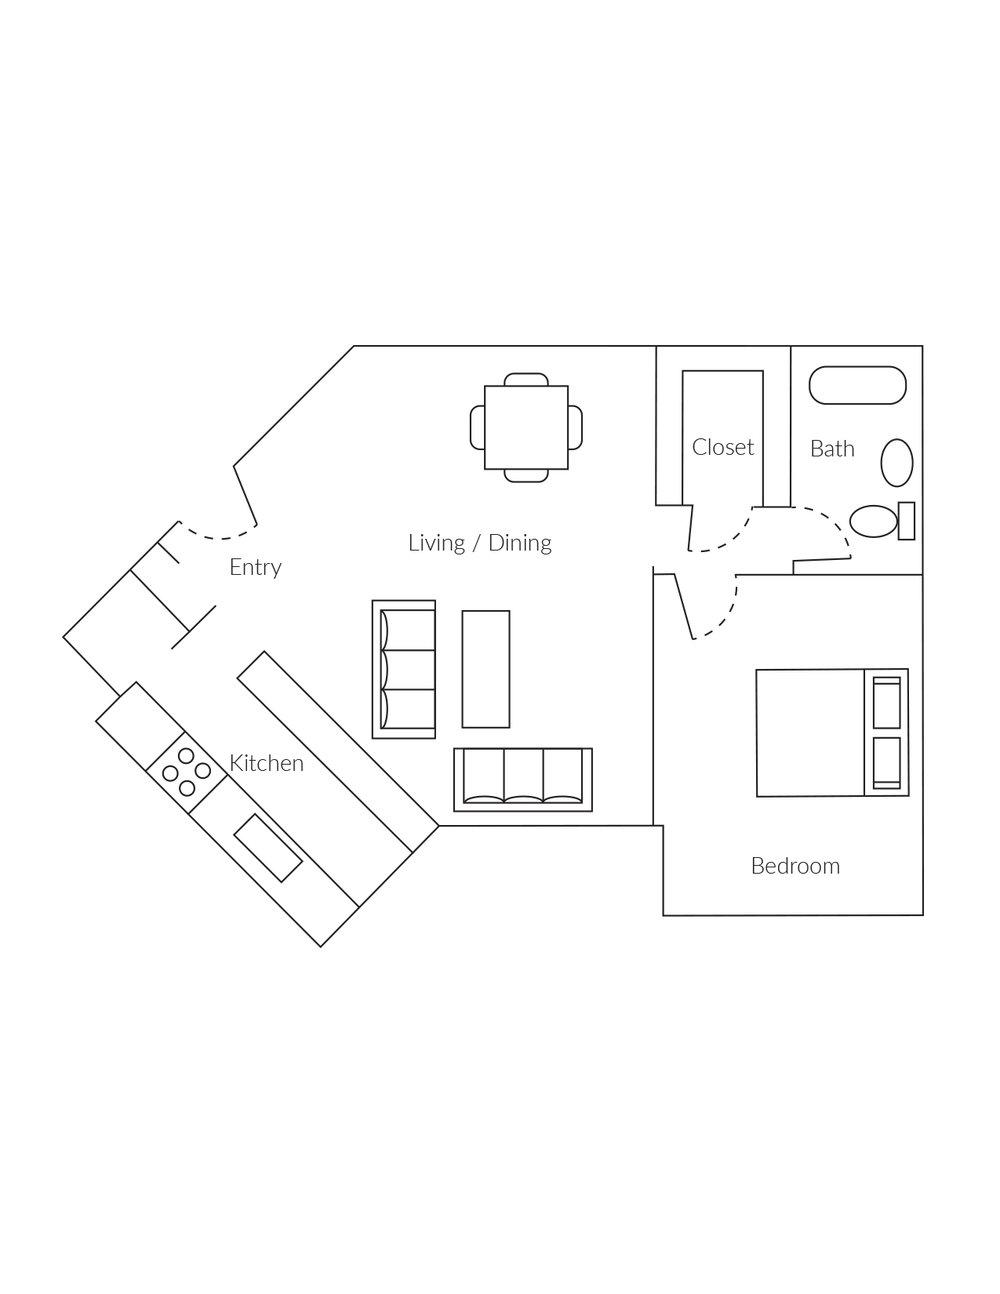 1 bedroom, 1 bathroom apartment